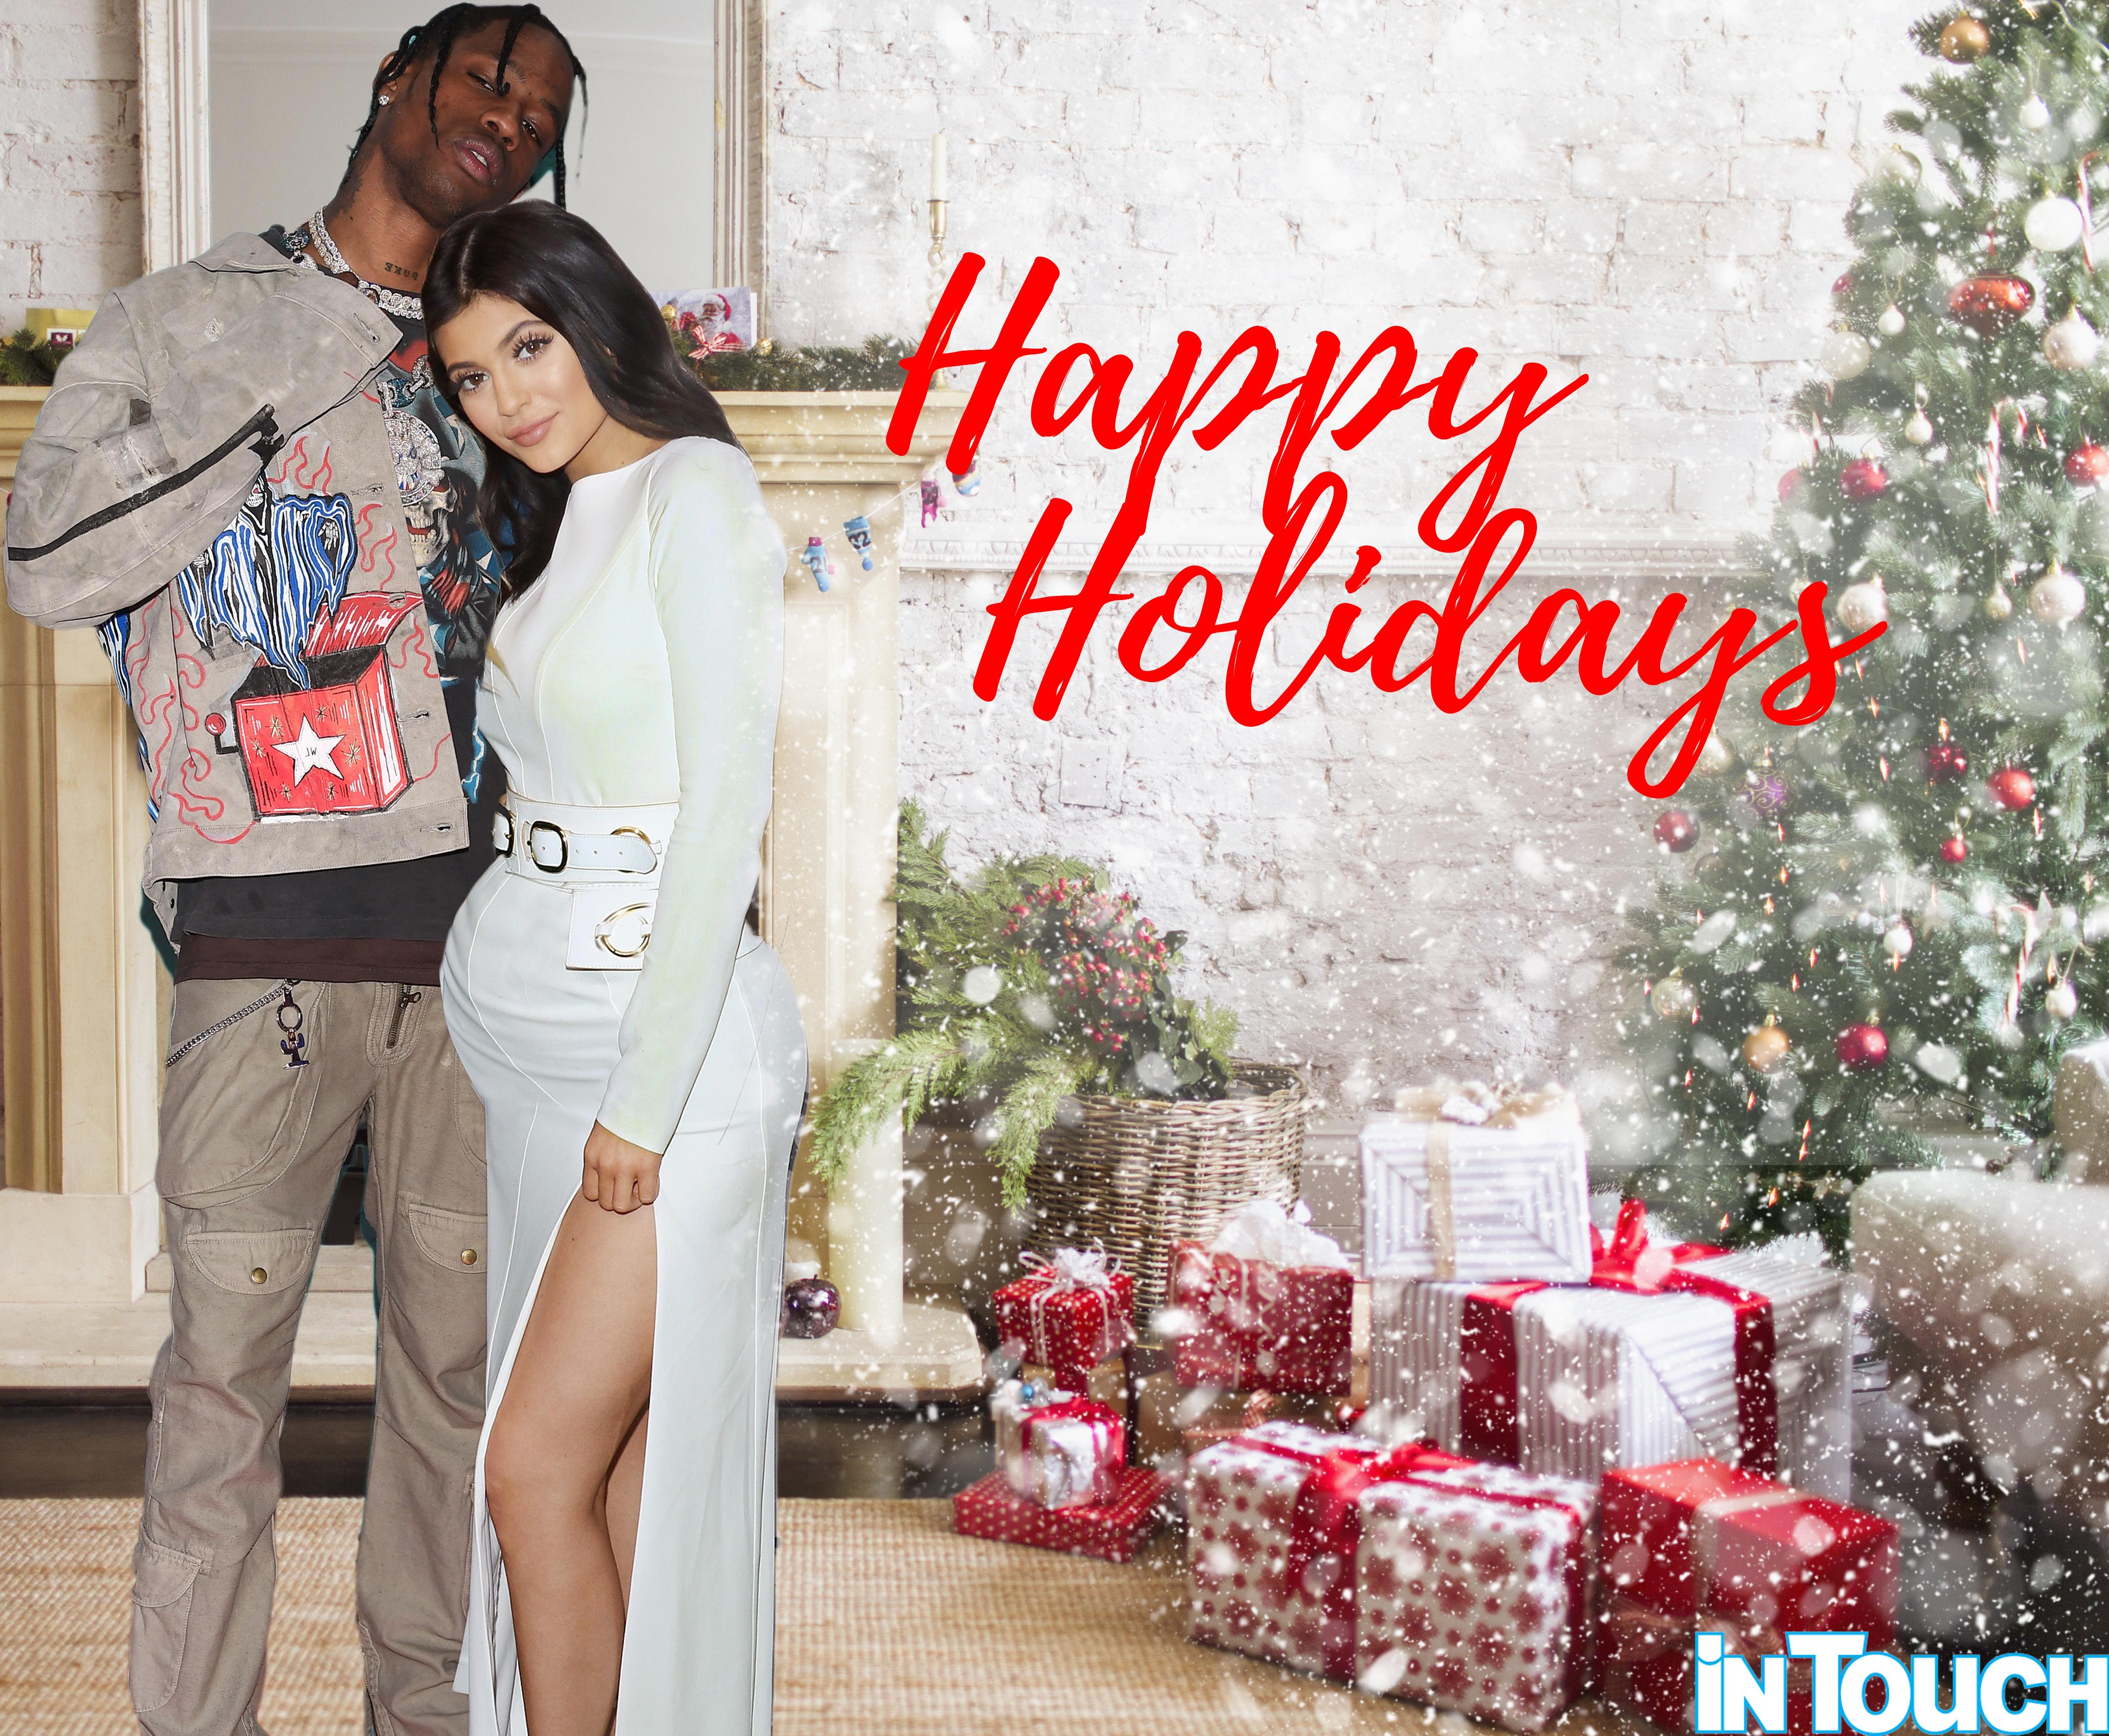 Kardashian Christmas Cards.We Photoshopped The Kardashians Christmas Cards Just Because